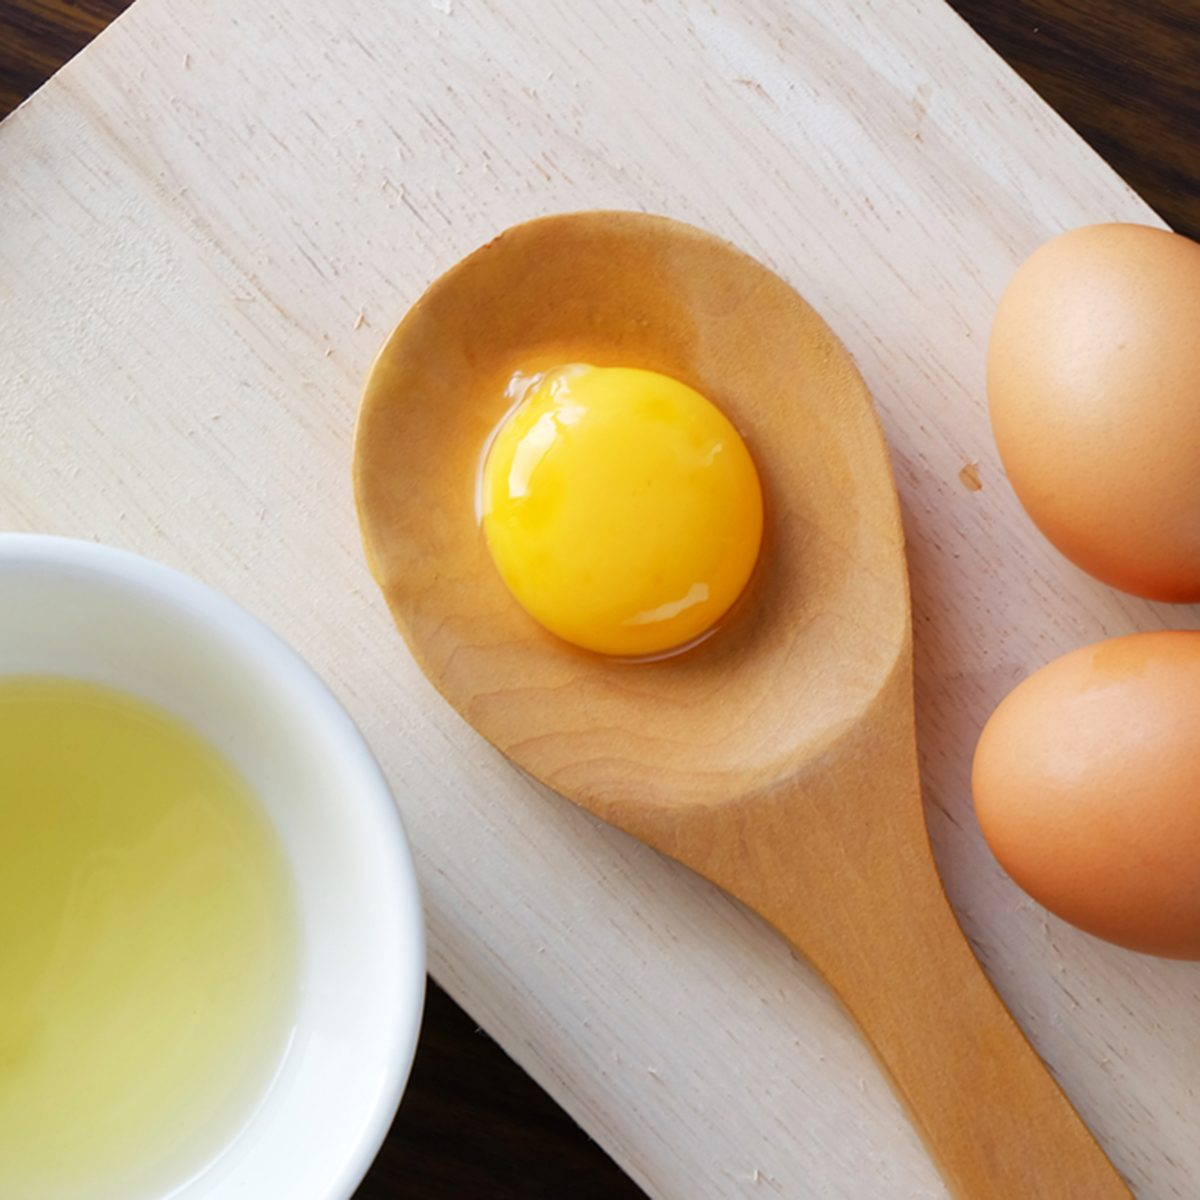 25 Brilliant Kitchen Shortcuts You'll Wish You Knew Sooner